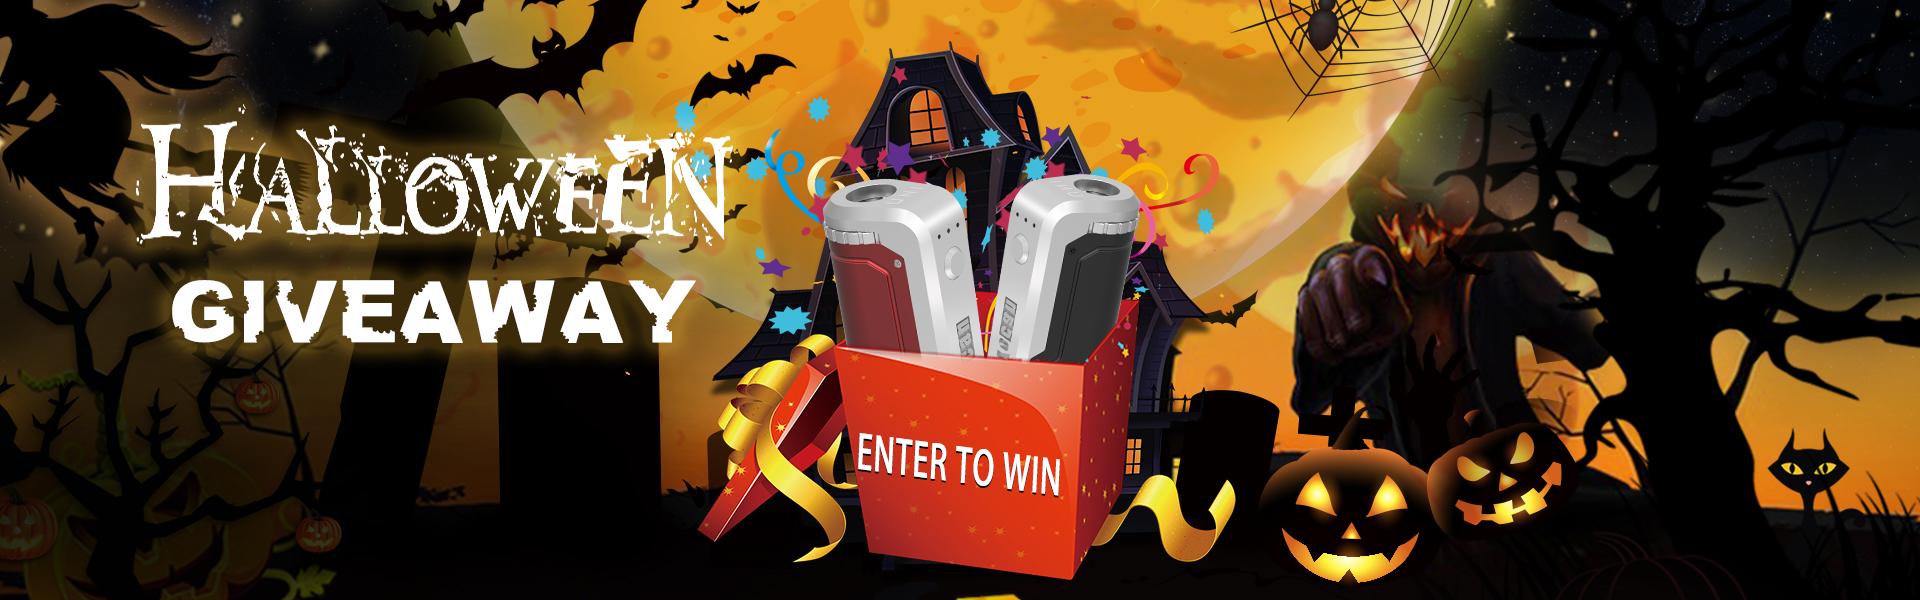 Yocan Halloween Giveaway